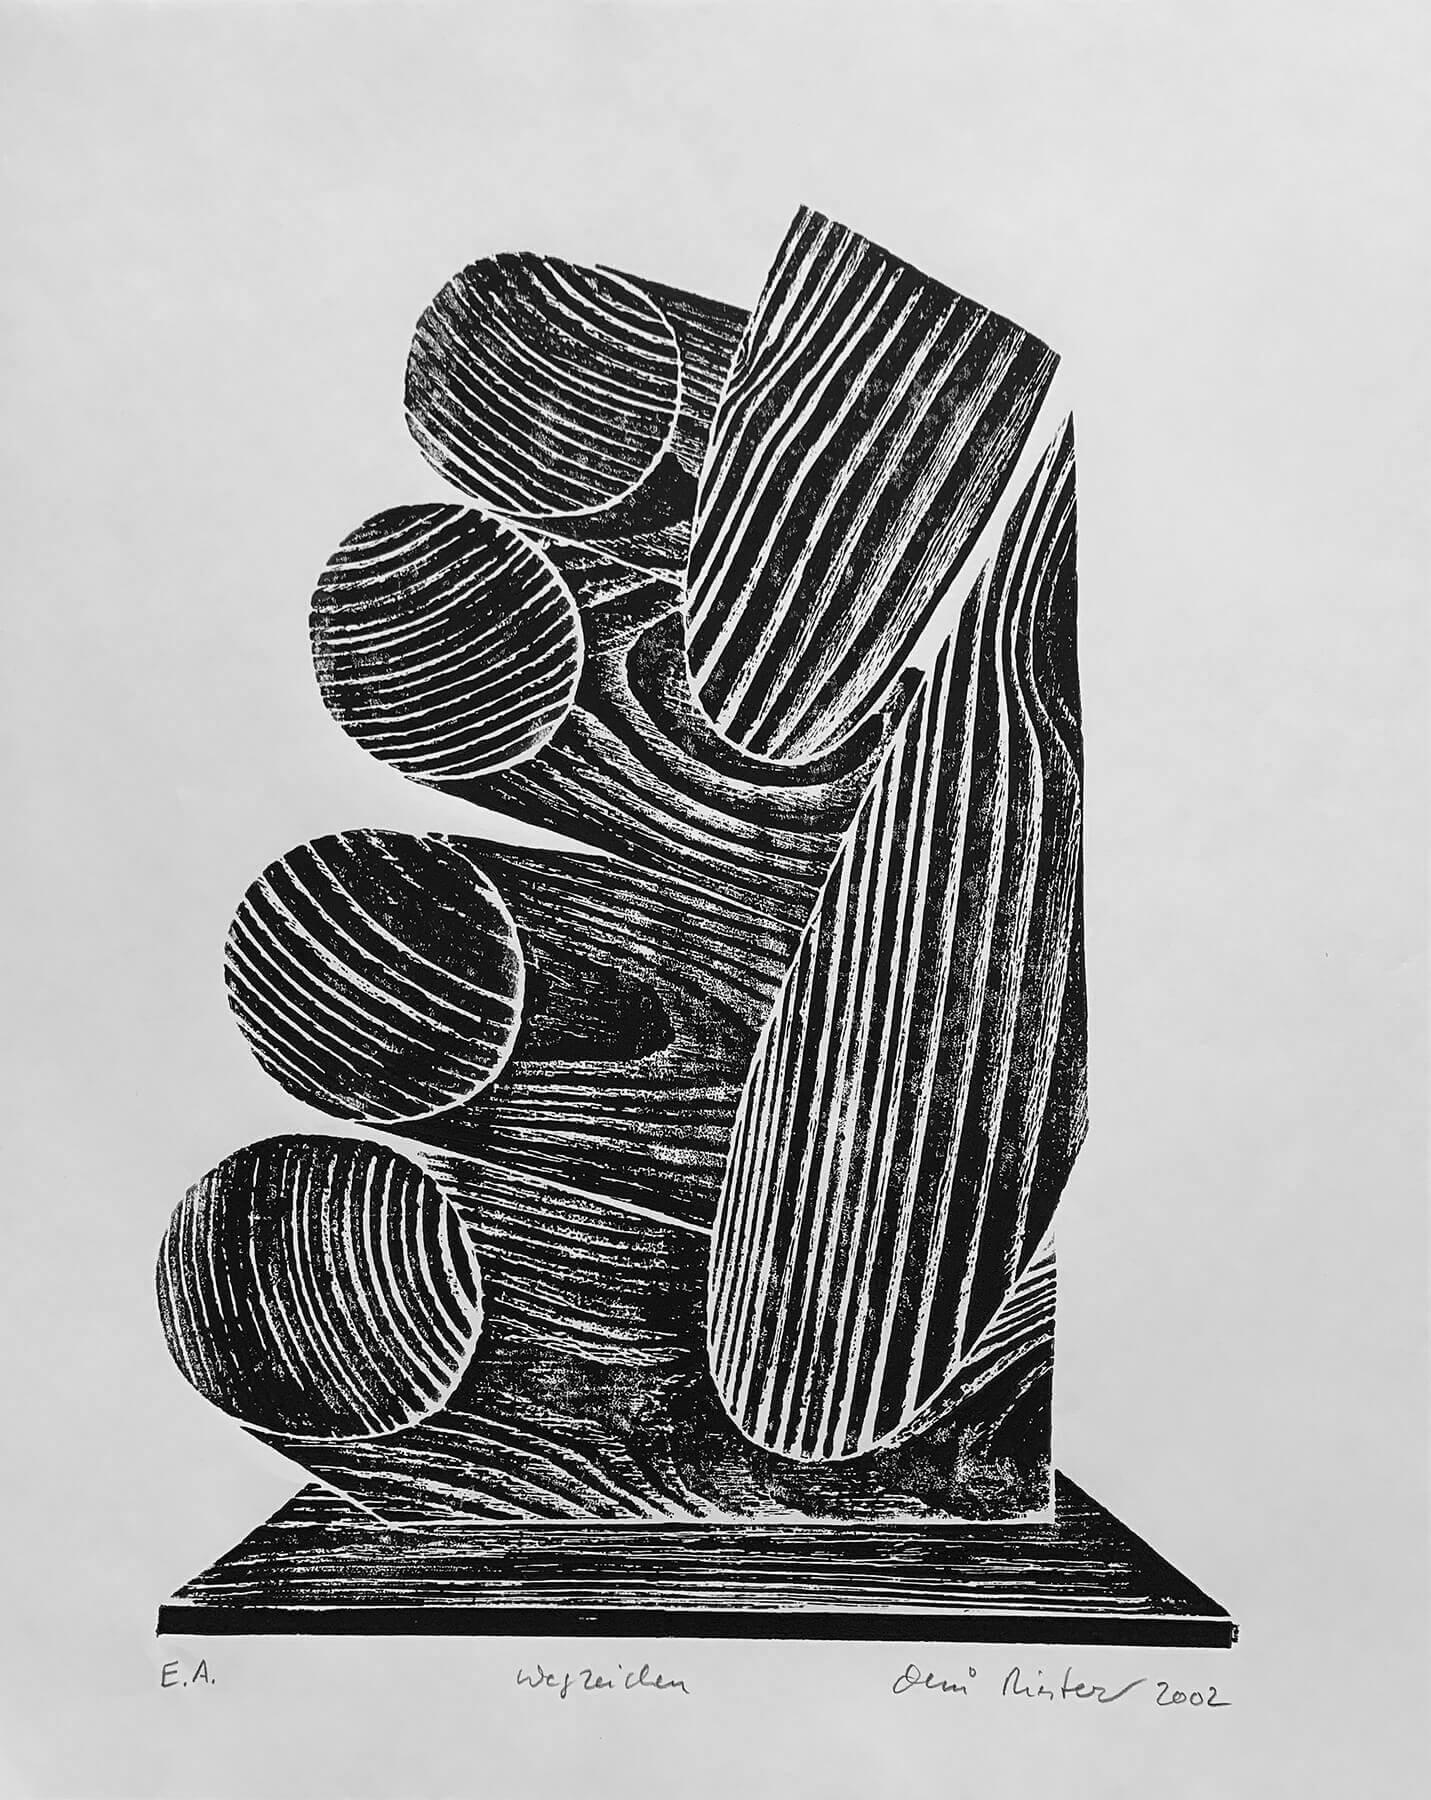 OMI Riesterer Grafik Karlsruhe Wegzeichen Holzdruck